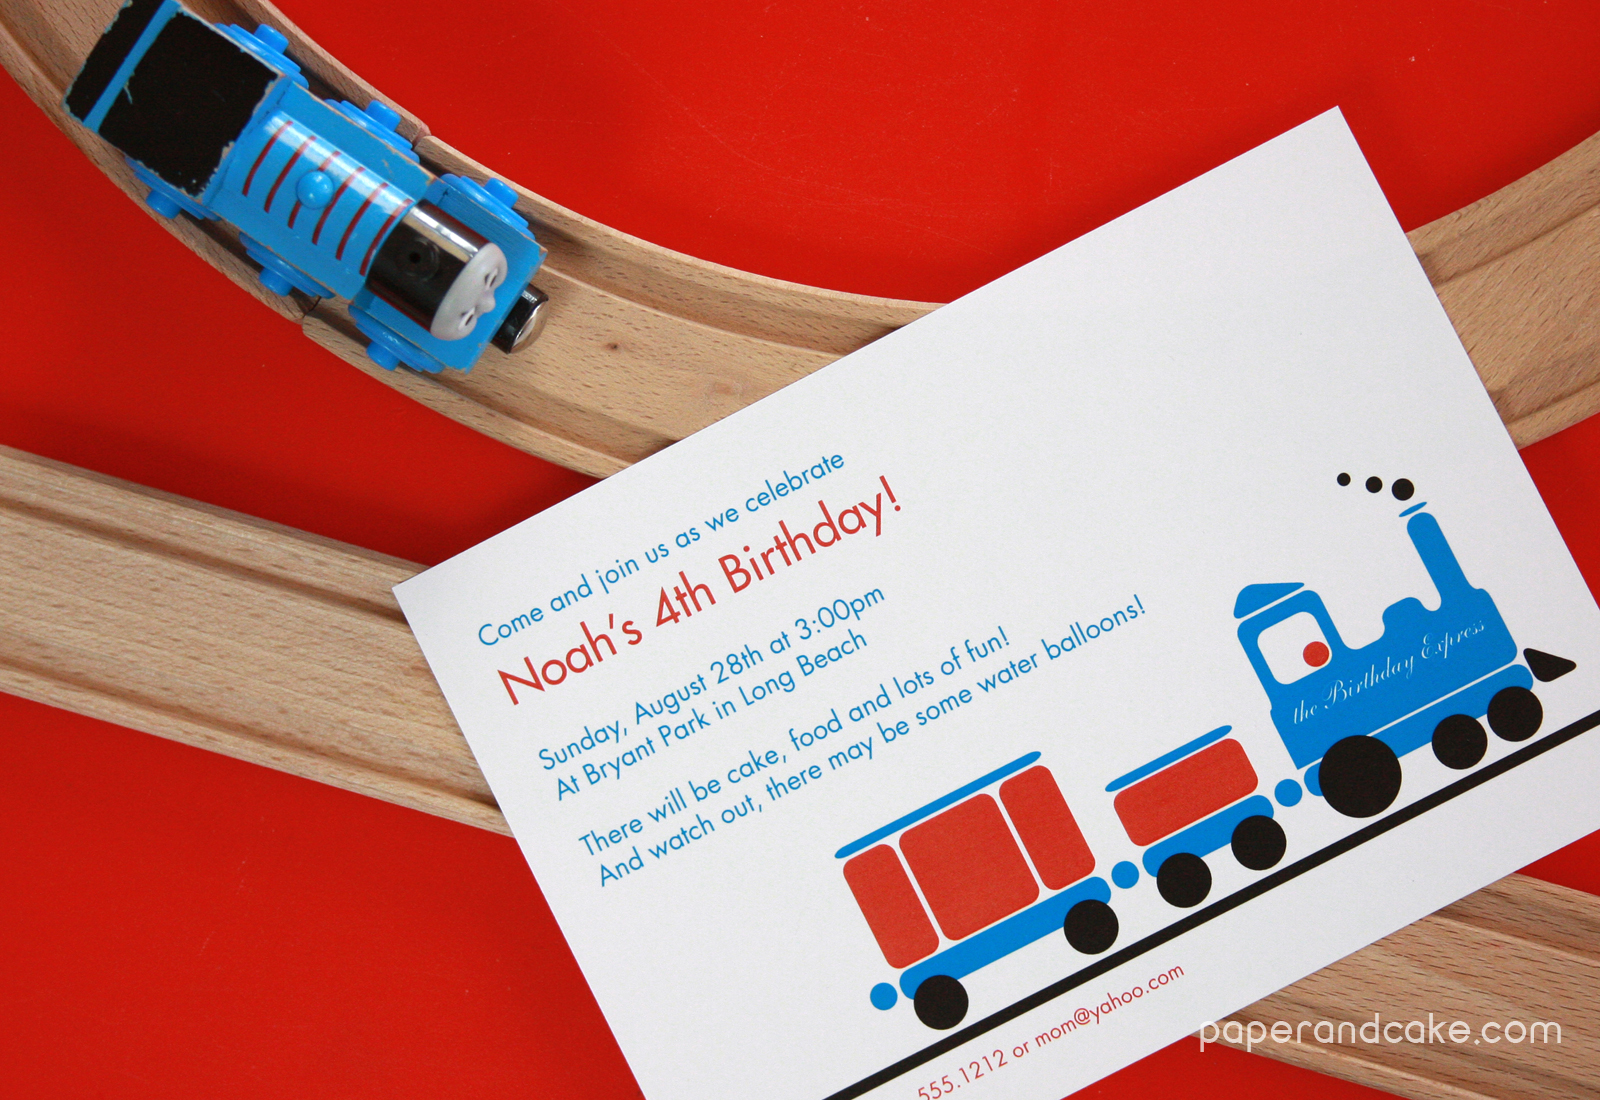 Free Thomas The Train Invitations for nice invitation ideas